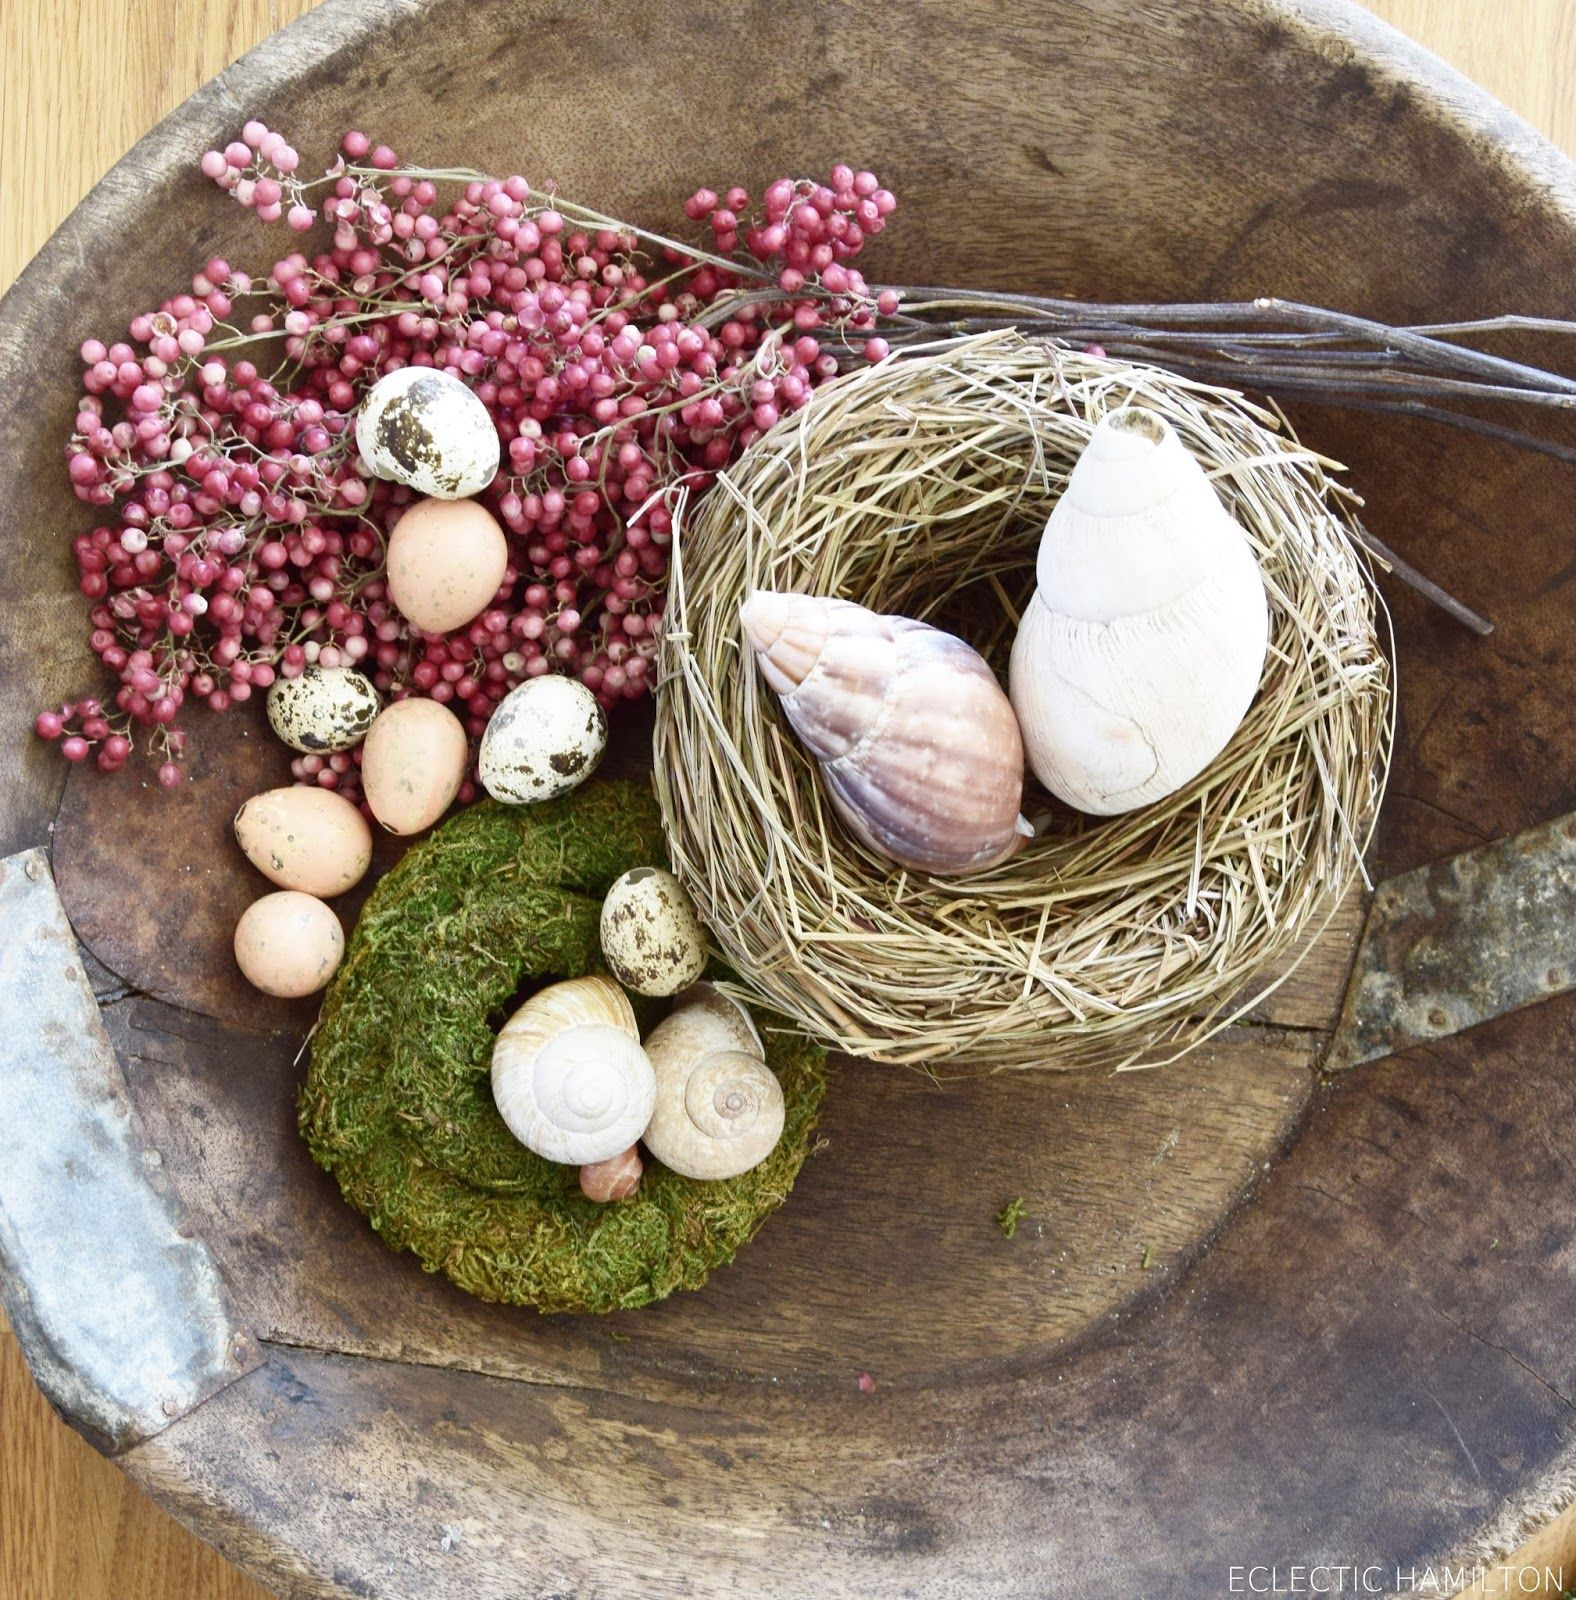 diy fr hlingsdeko f r schale holzschale tischdeko nat rlich fr hlingshafte deko eier ostern deko. Black Bedroom Furniture Sets. Home Design Ideas